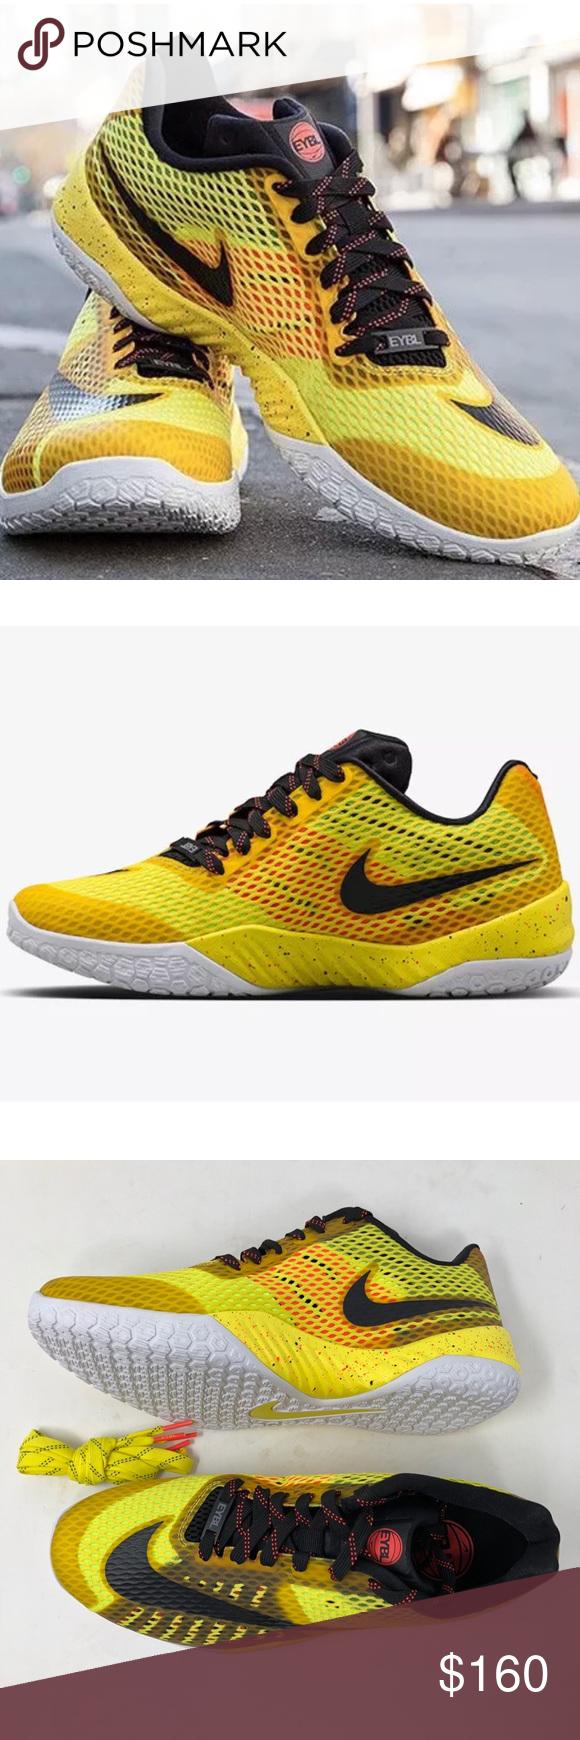 size 40 ac066 502f5 Nike Hyperlive Promo EYBL Basketball 849308-706 10 Nike Zoom Hyperlive  Promo EYBL Basketball Sneakers